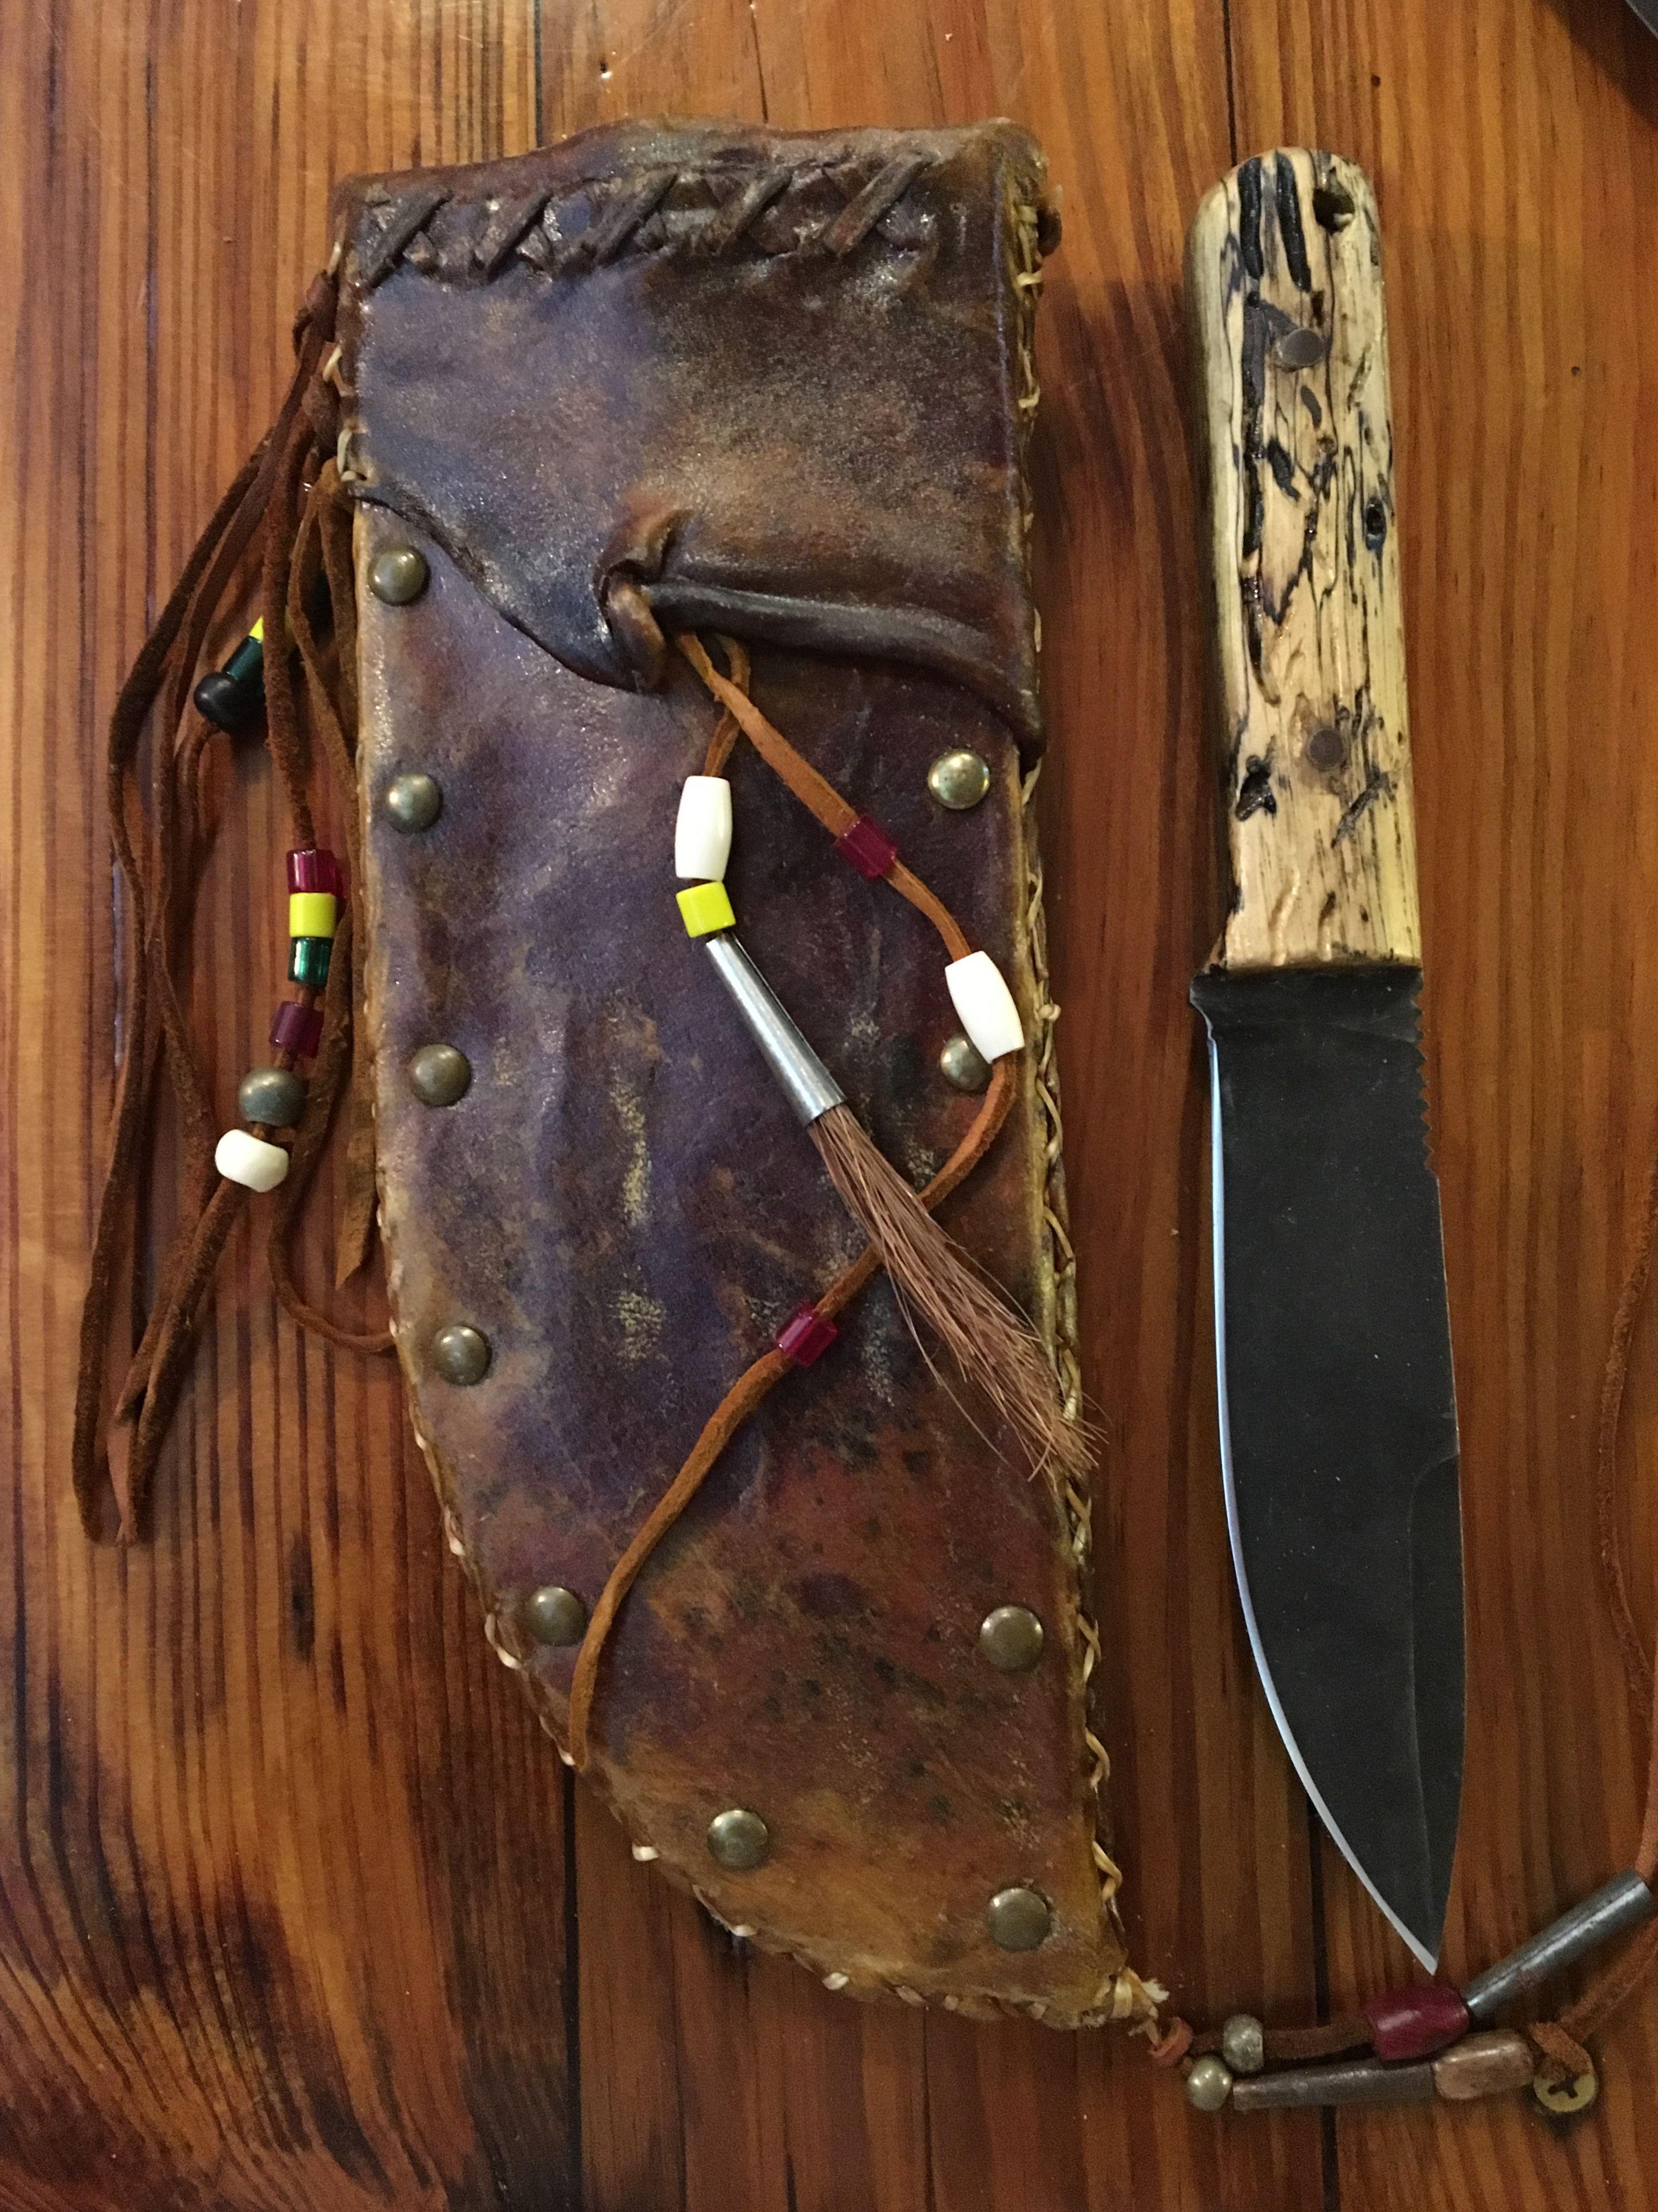 Rawhide Sheath Hickory Handles On Knife Boot Knife